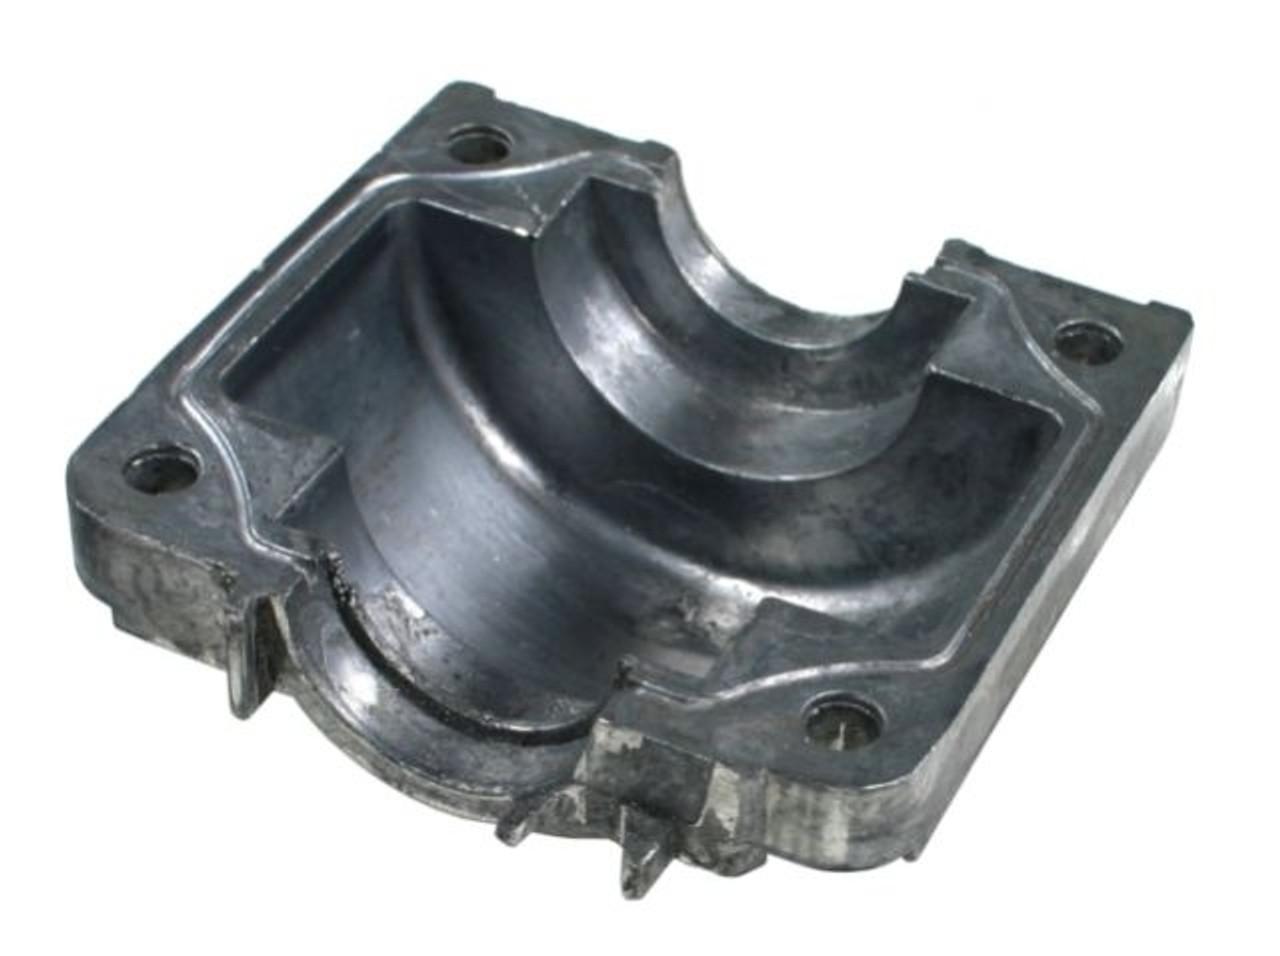 Stihl 021, 025, Ms 210, Ms 250 Engine Pan 11230212500